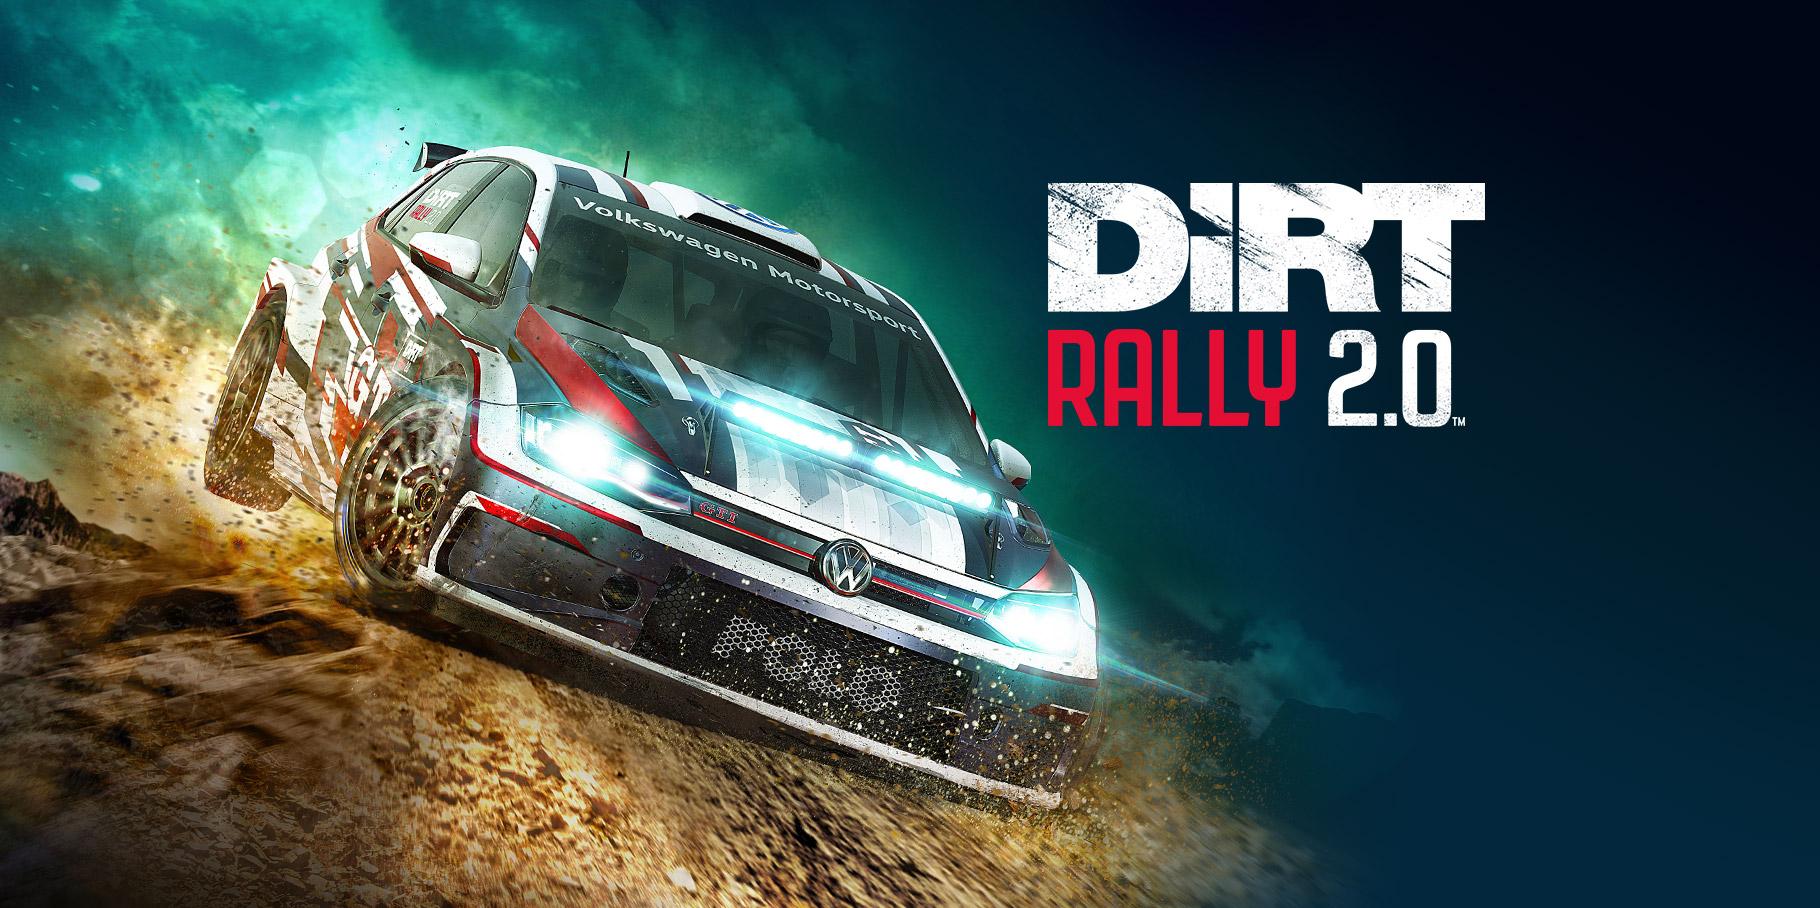 DiRT Rally 2.0 review – hardcore racing